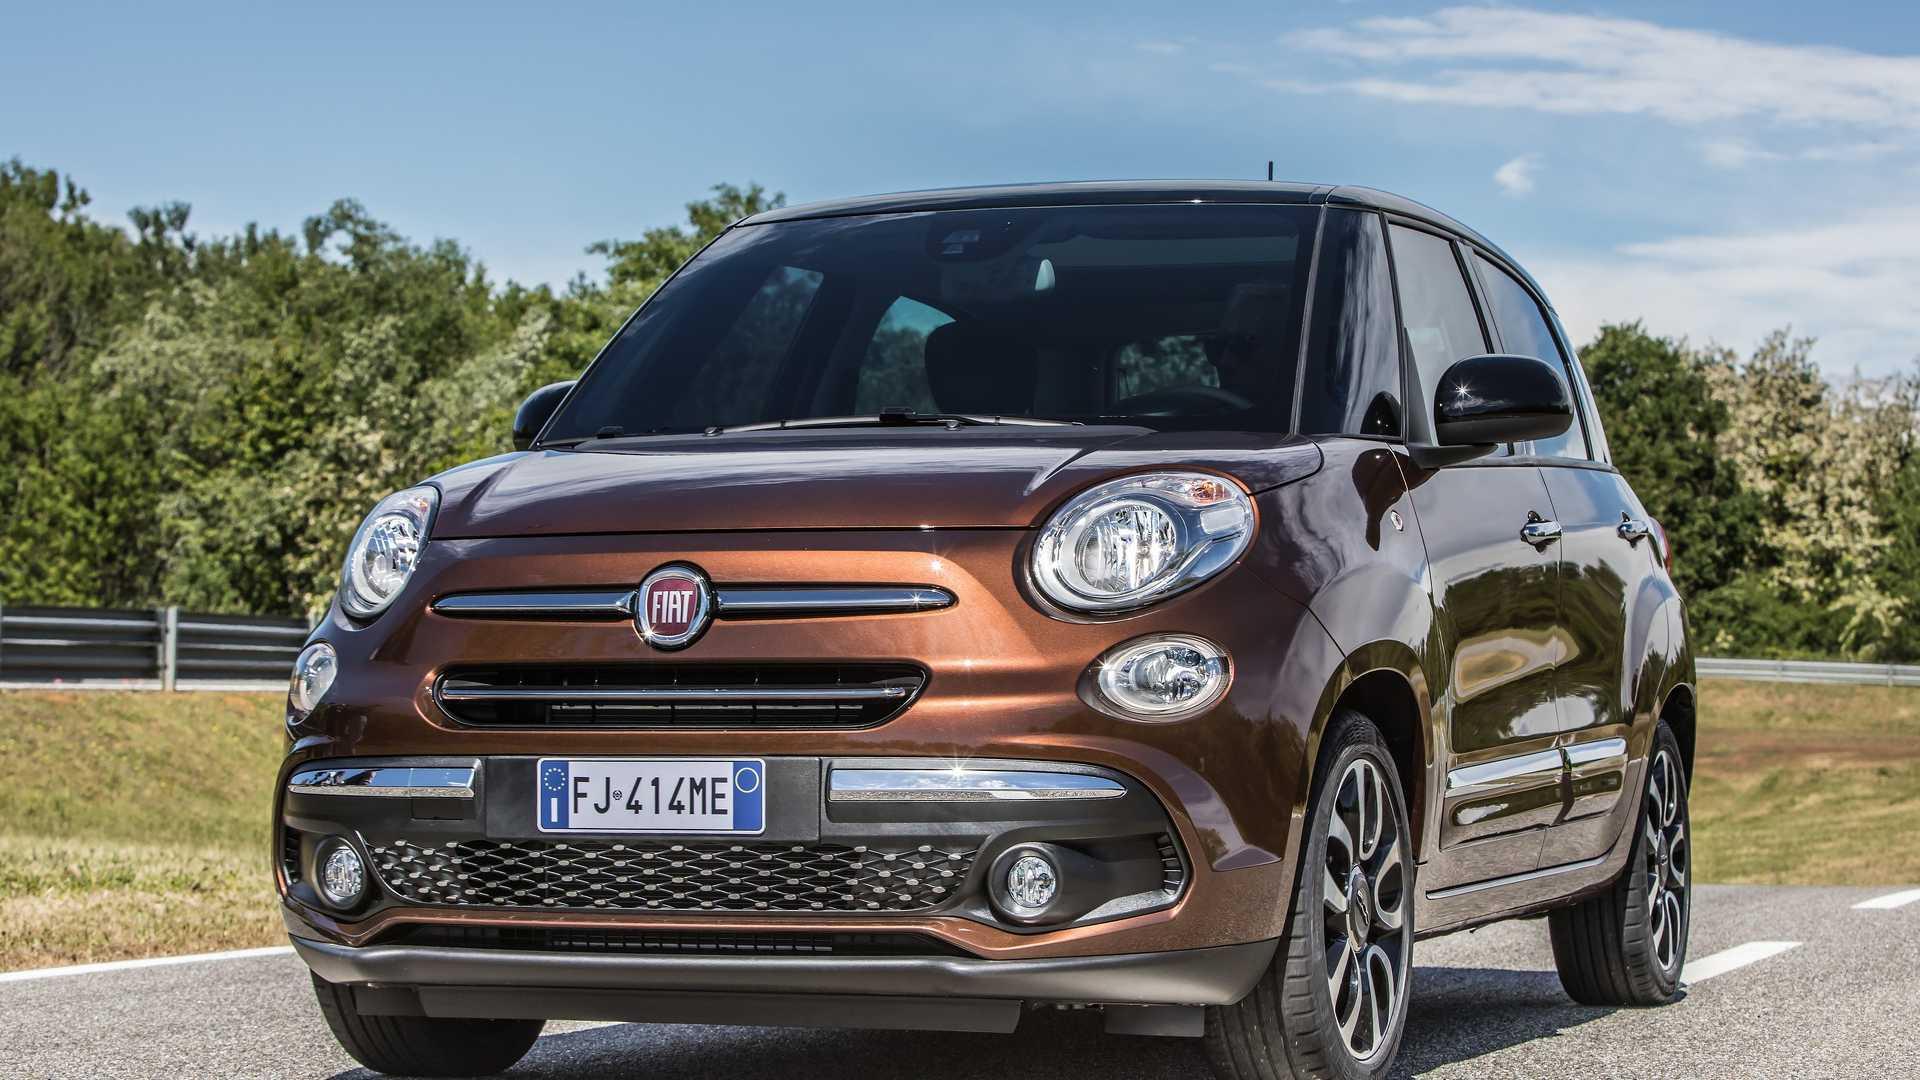 2018_Fiat_500L_facelift_01